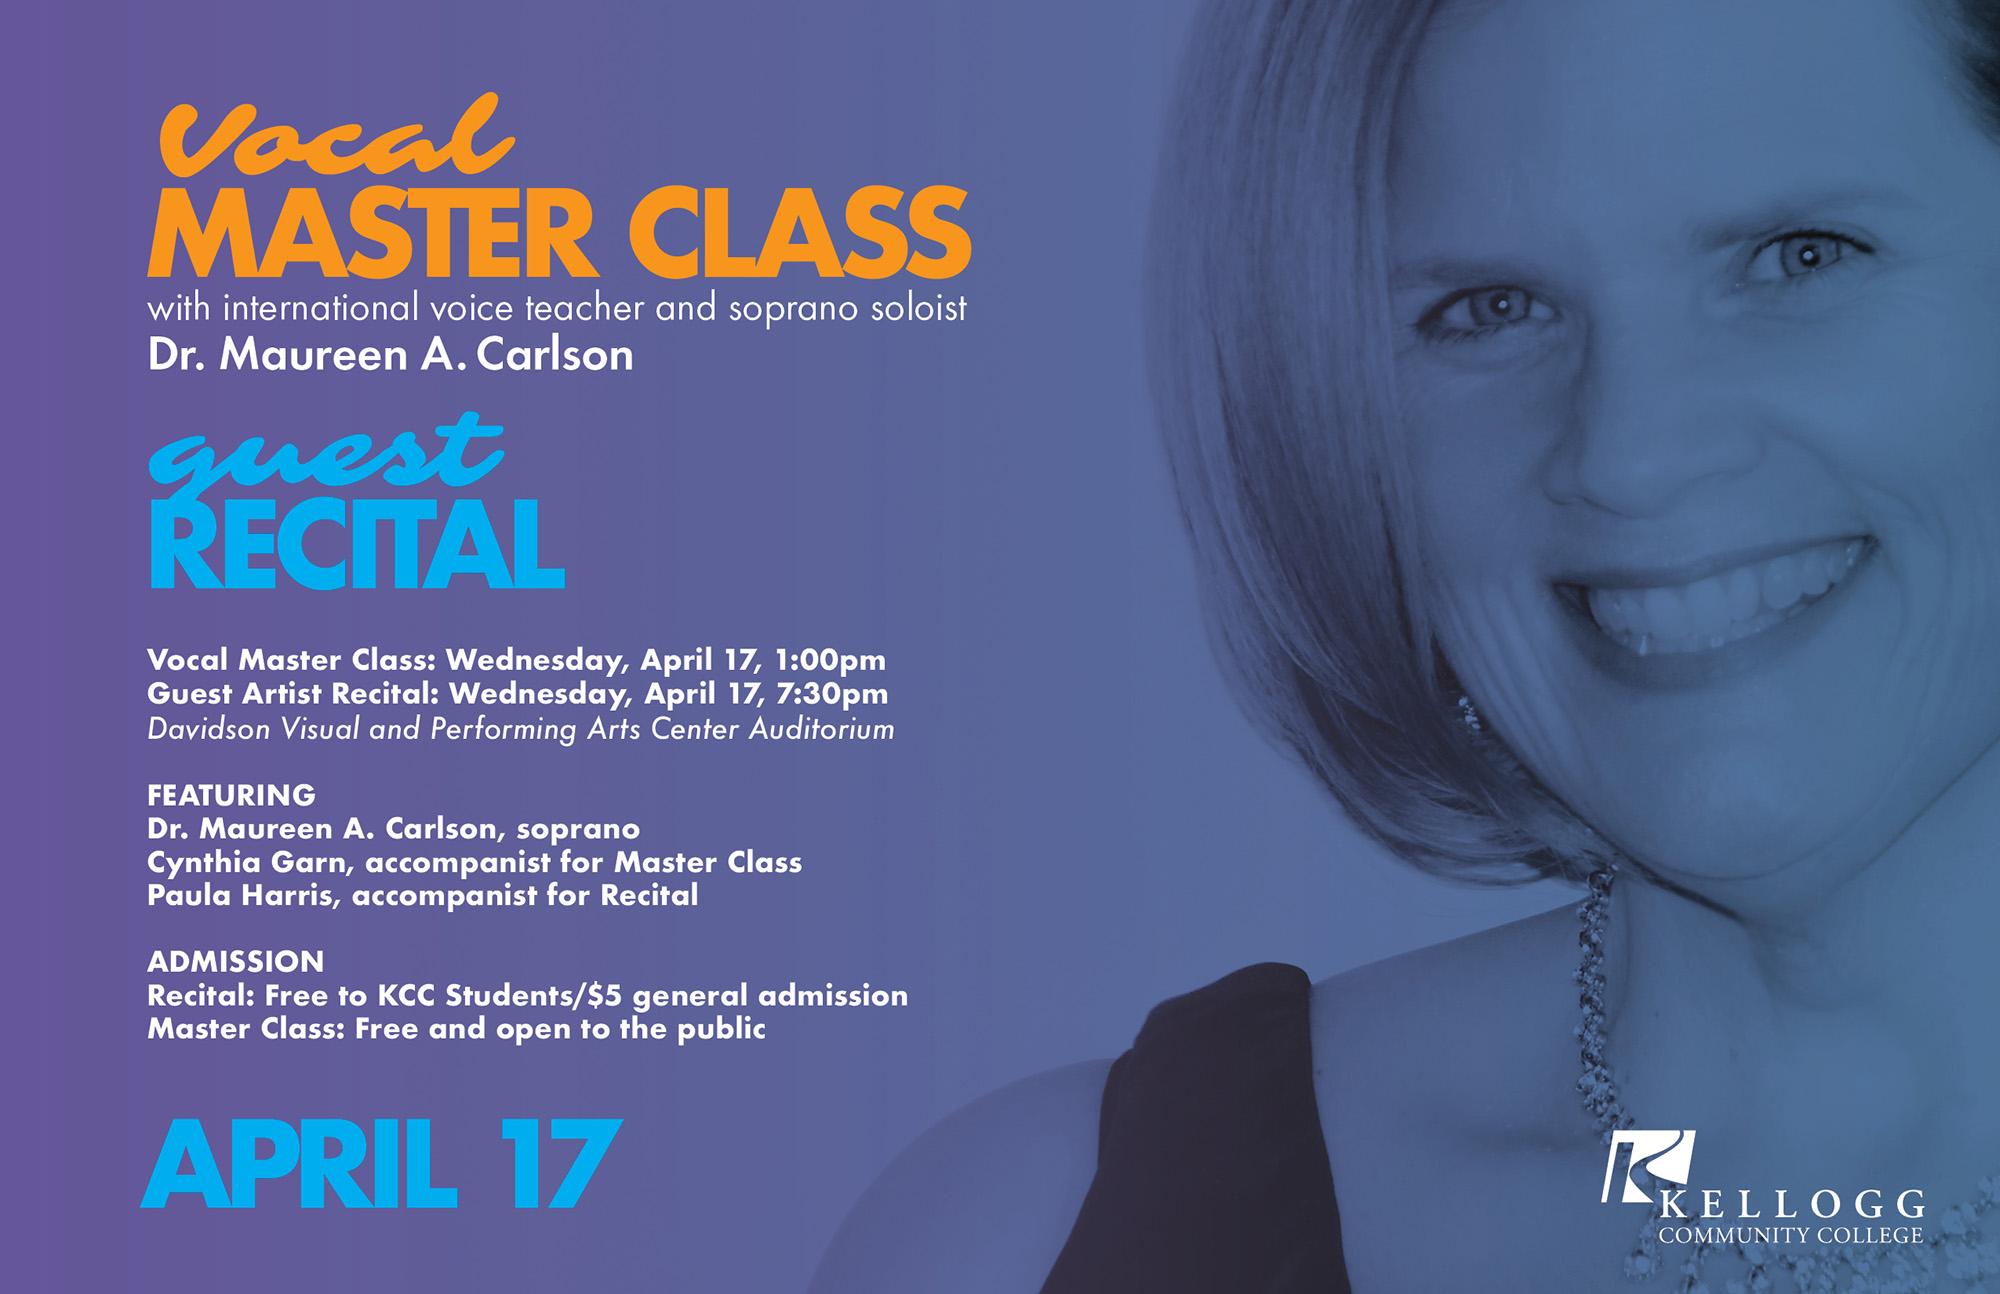 A text slide promoting Dr. Maureen Carlson's upcoming recital at KCC.